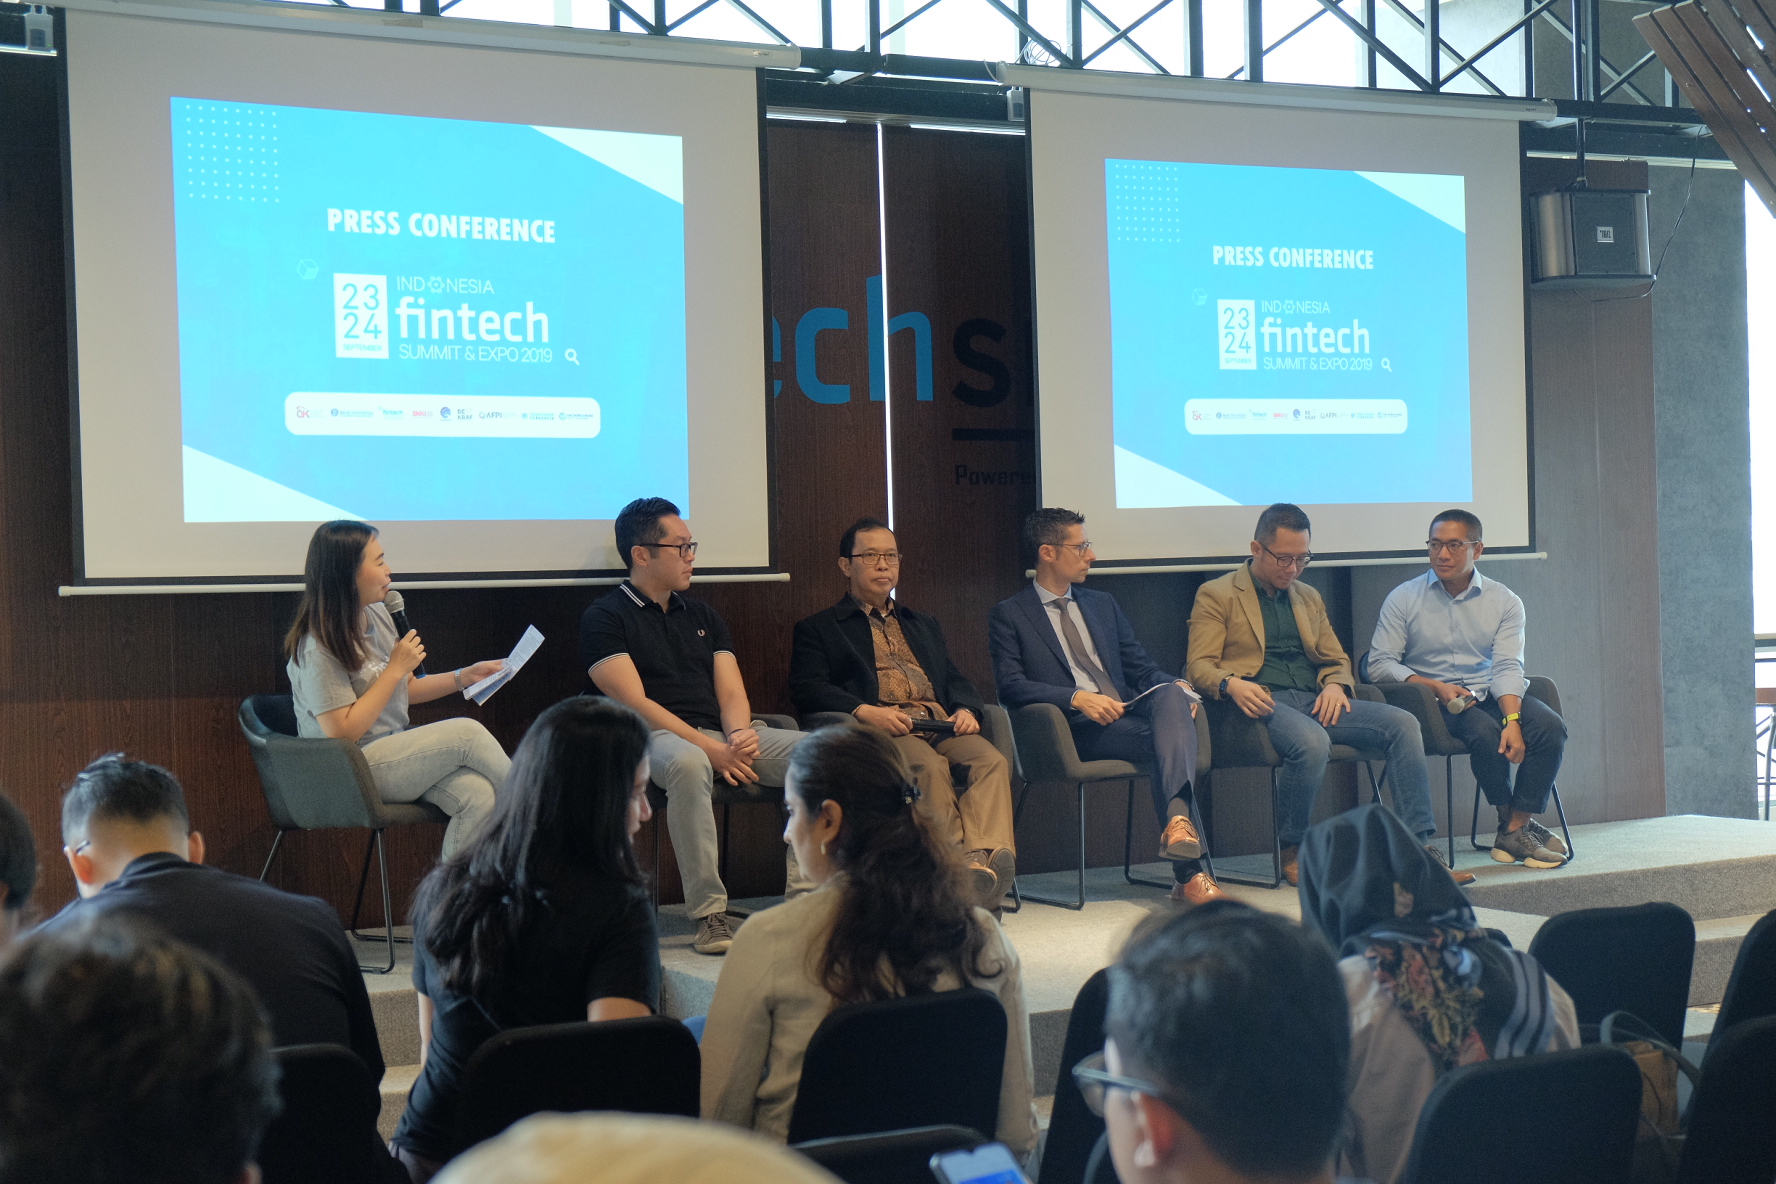 Indonesia Fintech Summit & Expo 2019 Menjadi Bukti Komitmen Industri Fintech terhadap Inklusi Keuangan